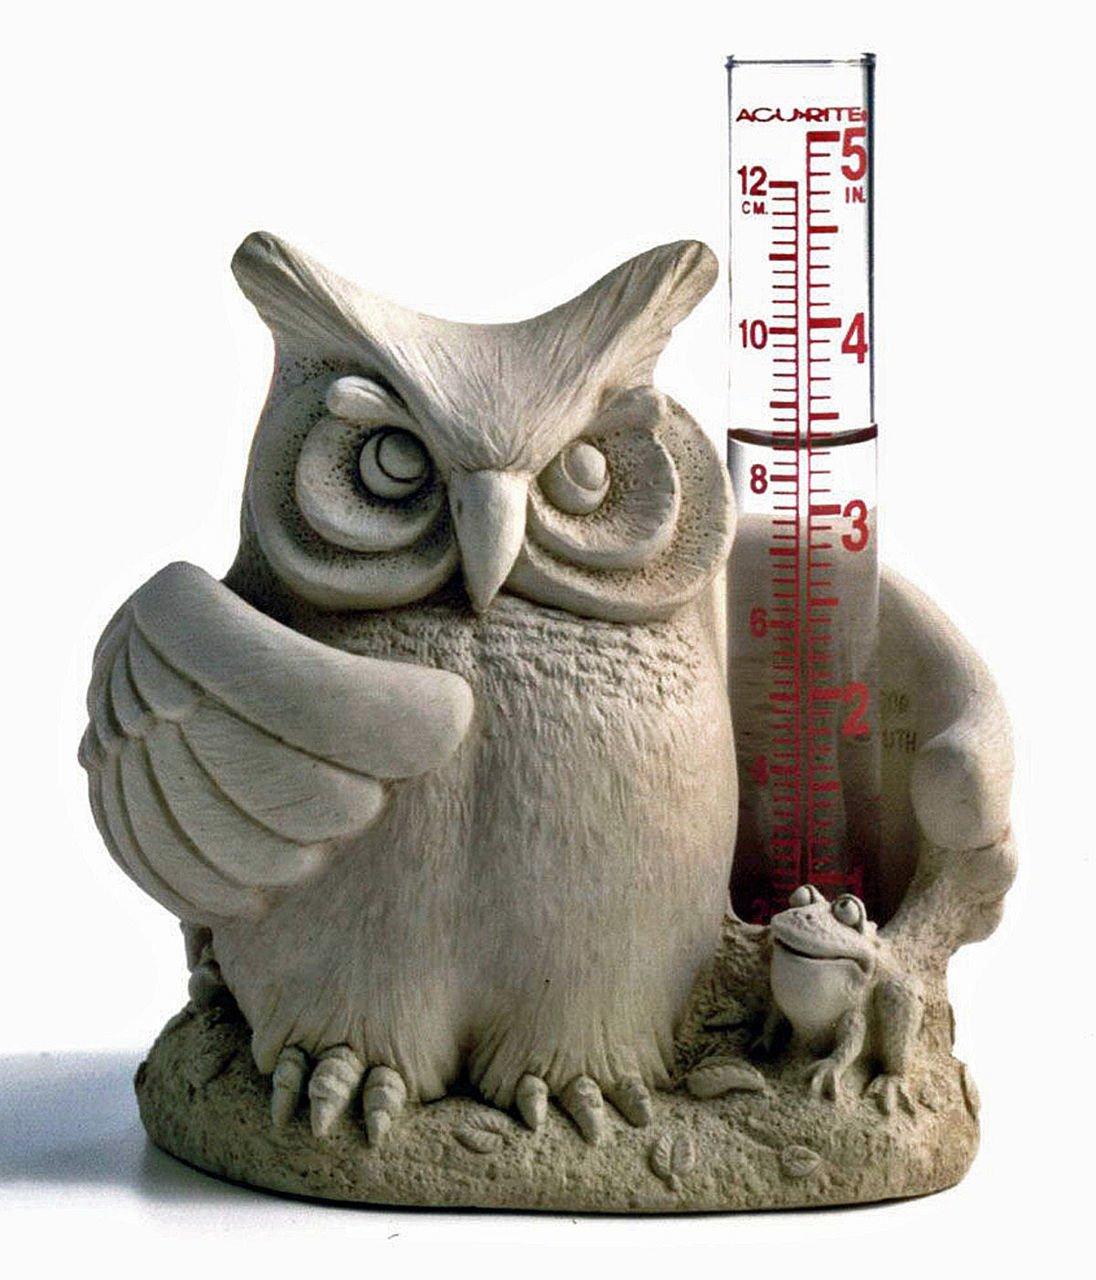 GARDEN DECOR - ''WISE OWL'' RAIN GAUGE - NATURAL STONE FINISH